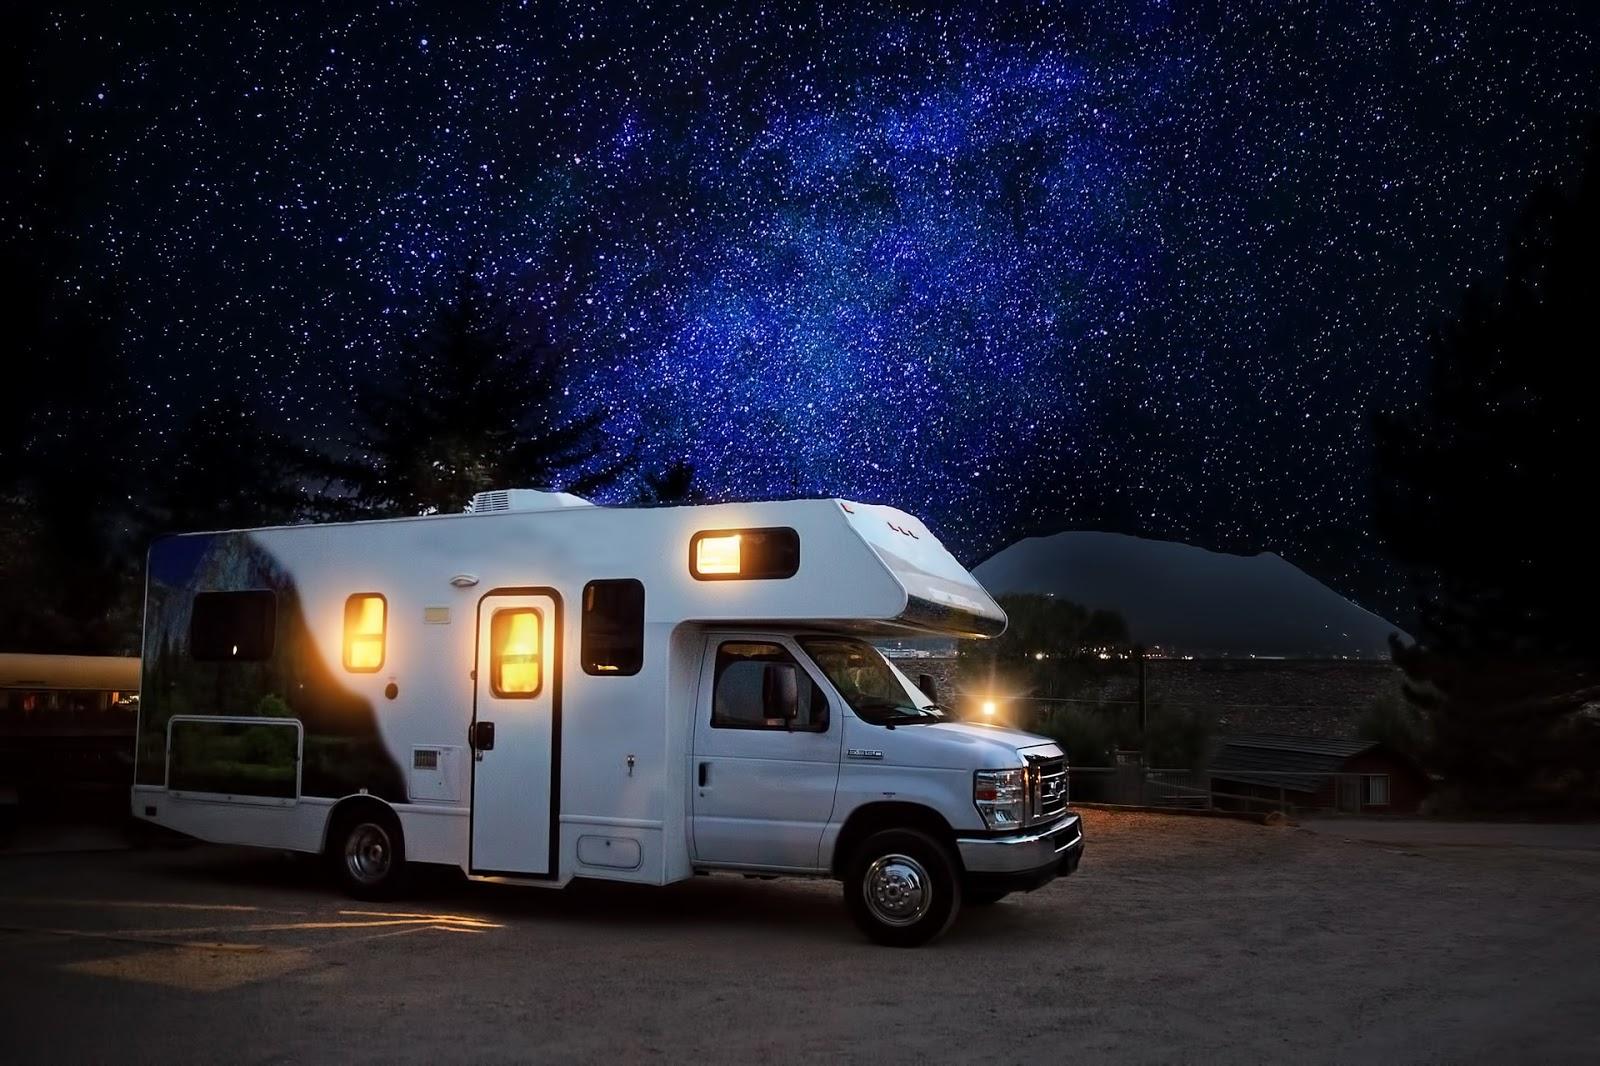 RVshare: an RV parked under a starry sky